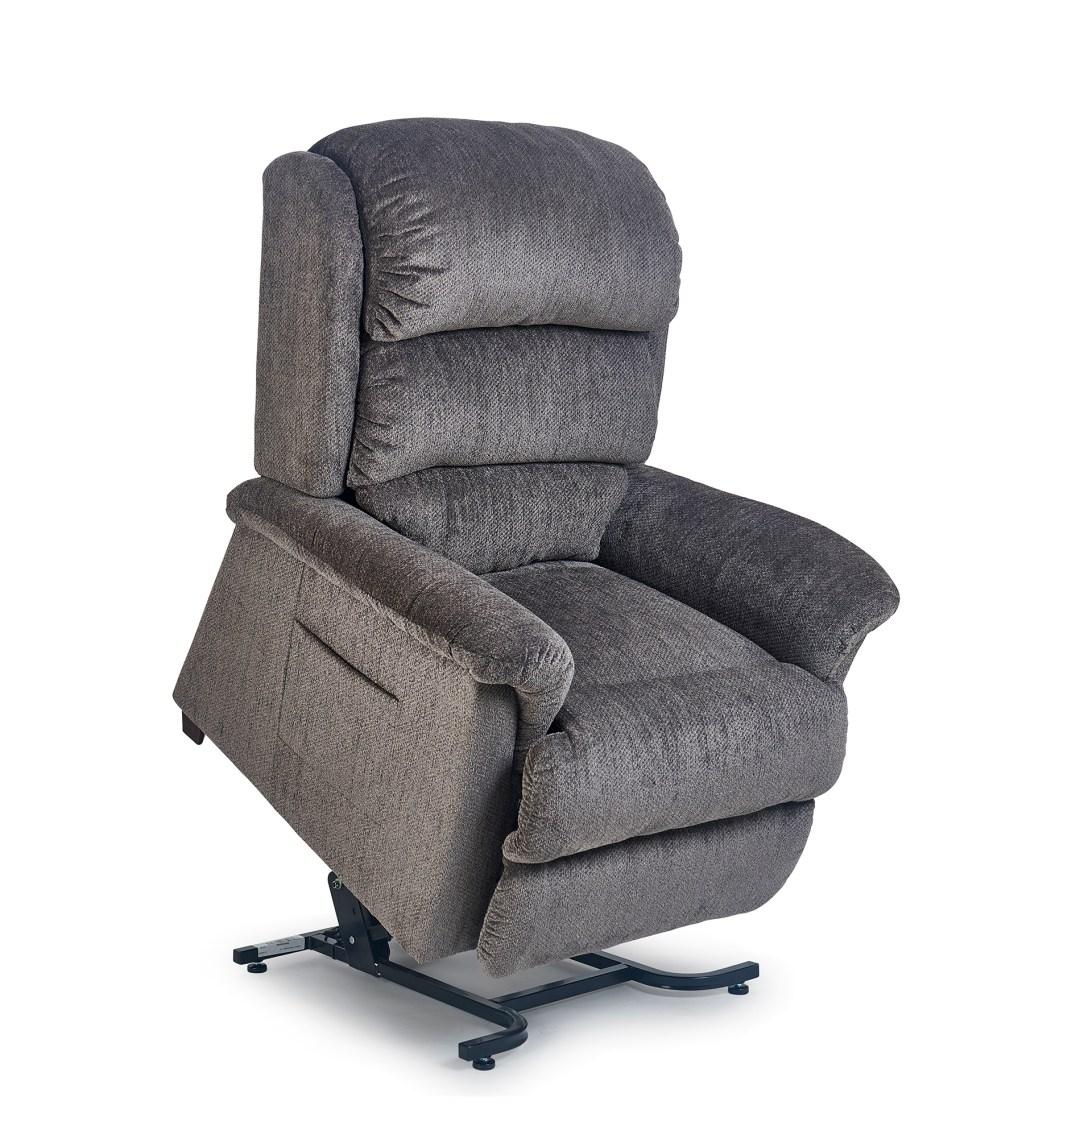 Tyndall Pedic Decompression Chair